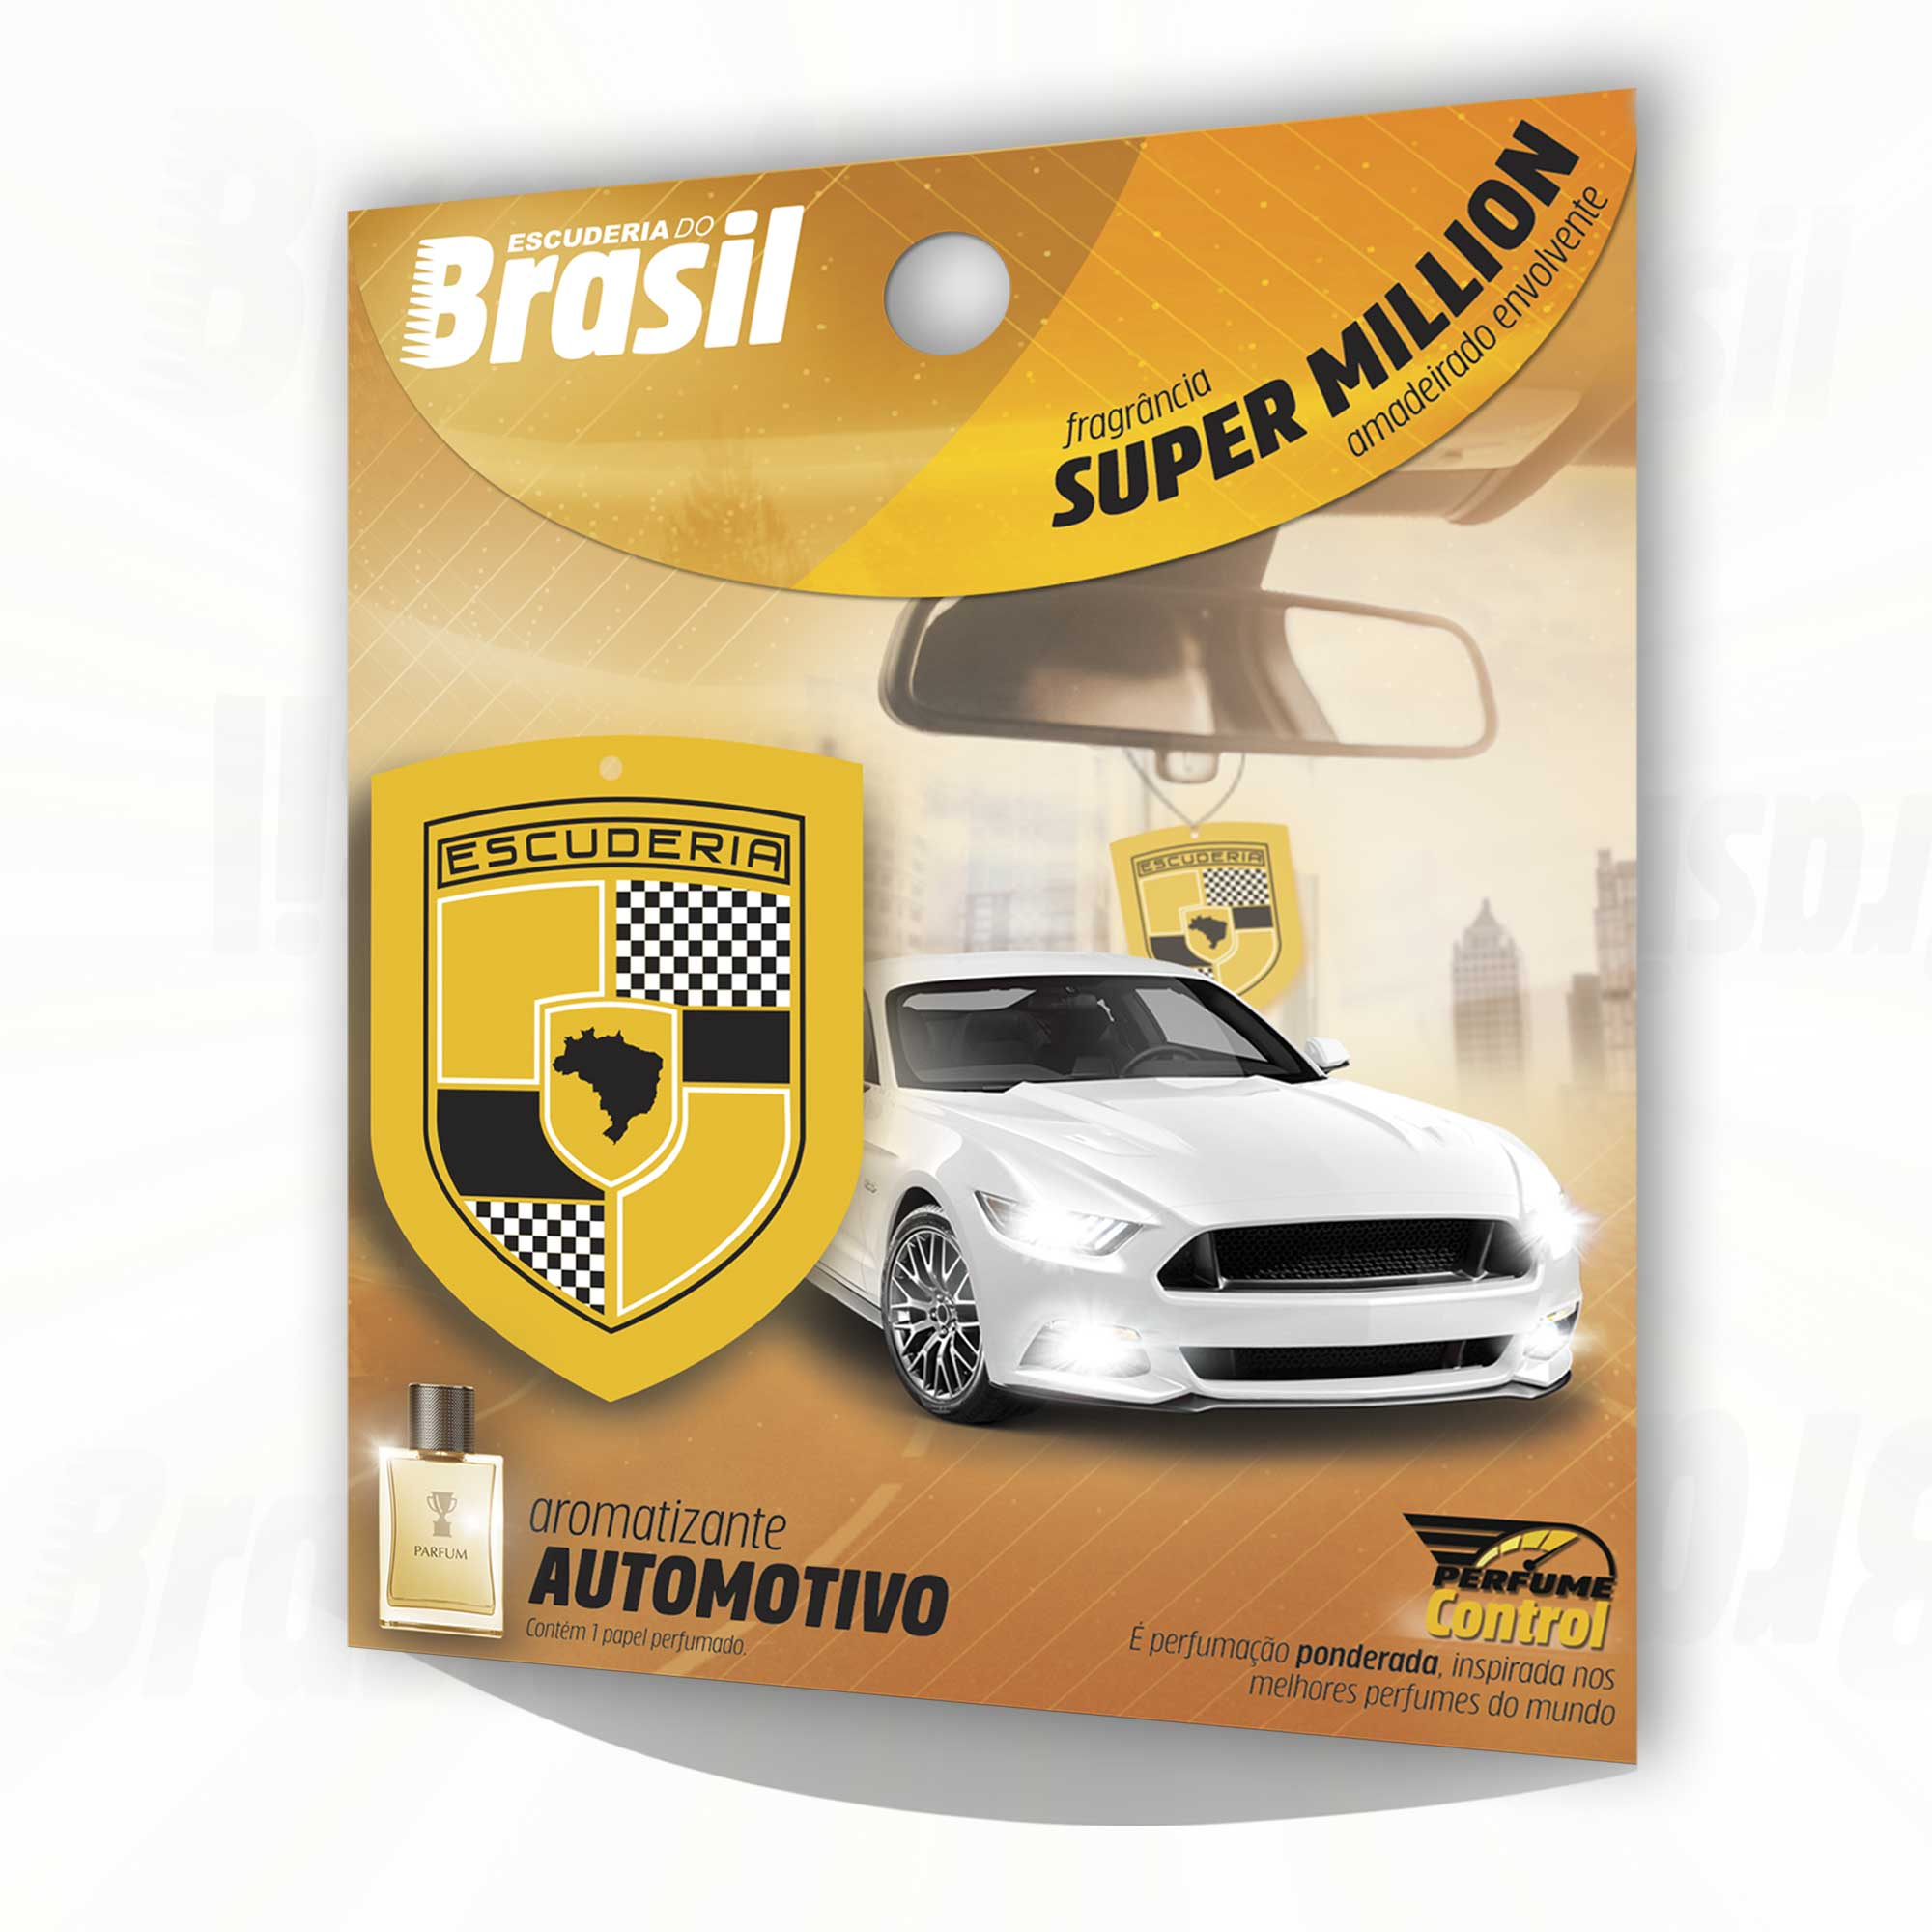 KIT Premium Detailer - 20 unidades - versões Control & Intense  - Escuderia do Brasil